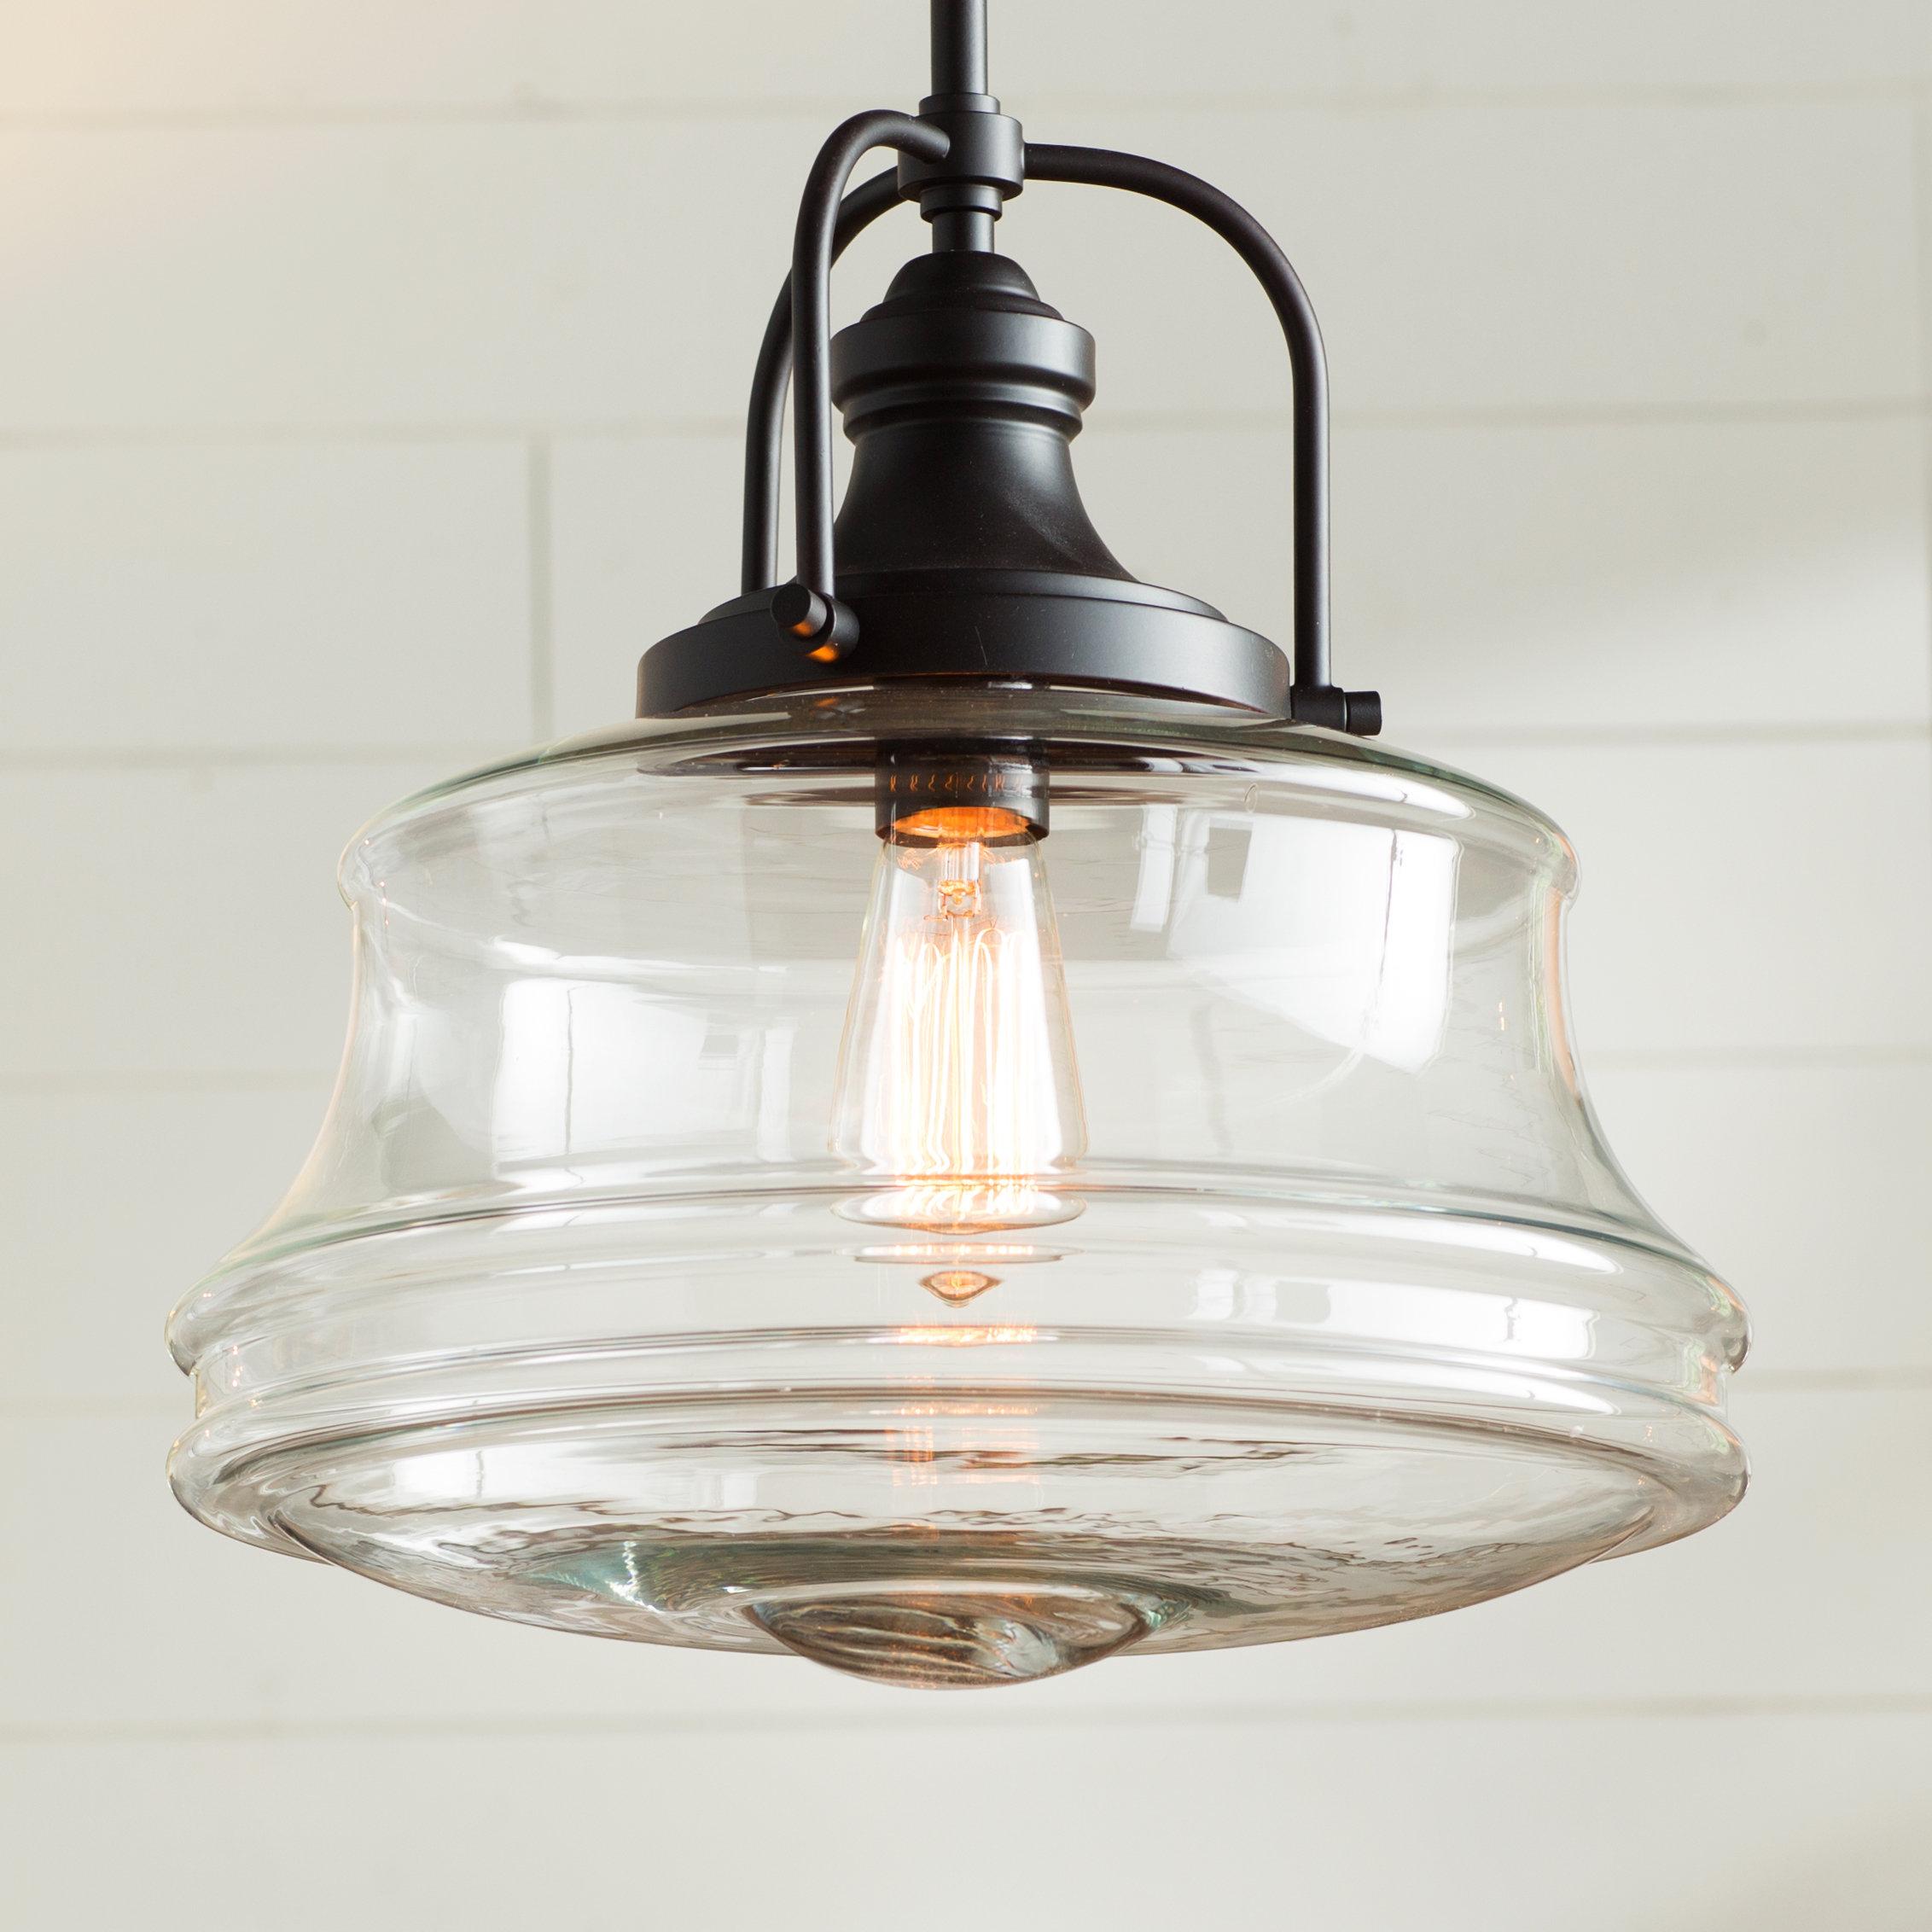 Featured Photo of Nadine 1 Light Single Schoolhouse Pendants